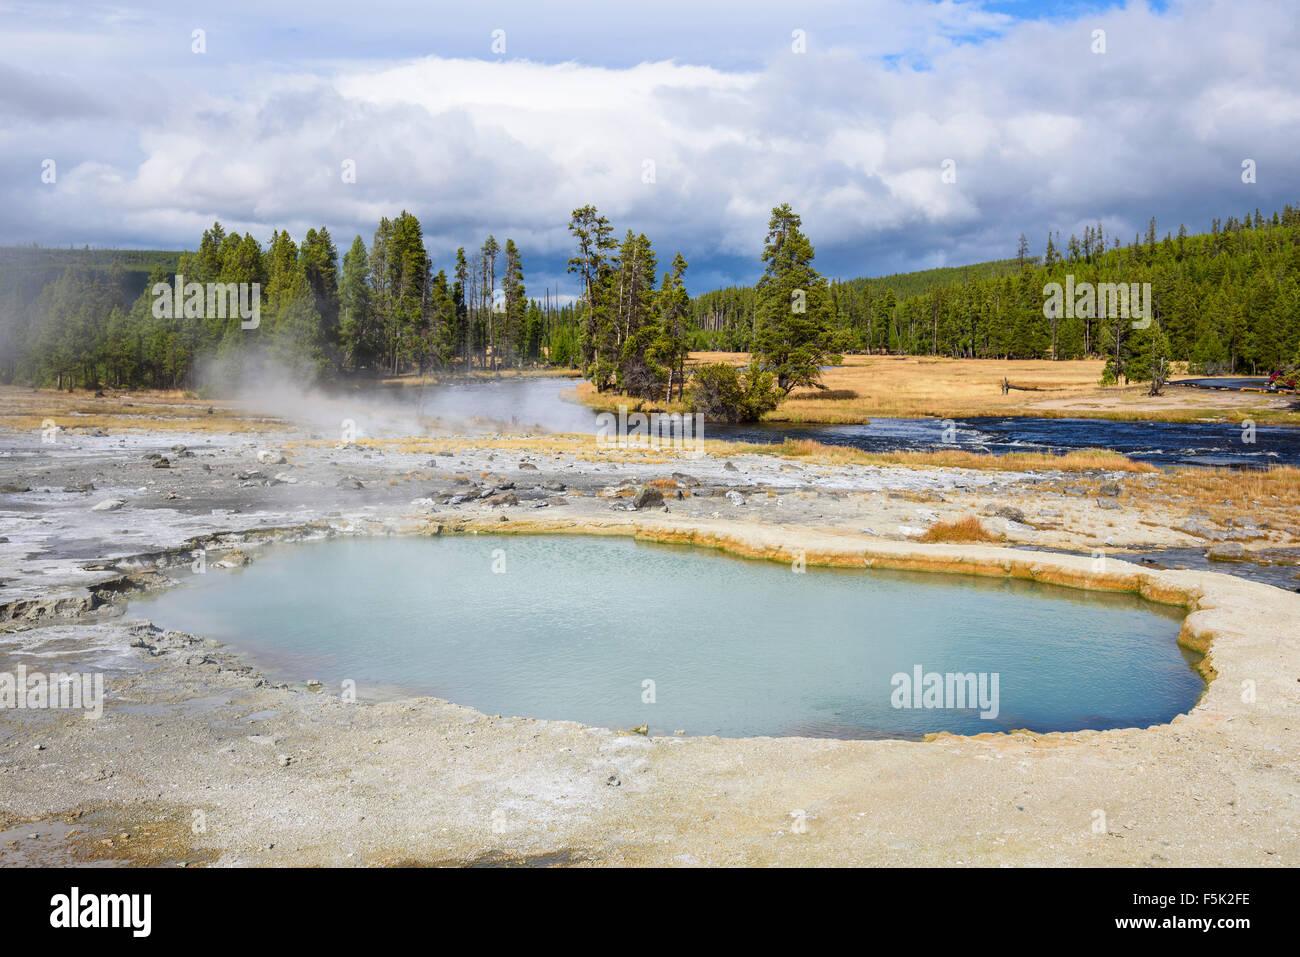 L Opale noire Printemps, Biscuit Basin, Parc National de Yellowstone, Wyoming, USA Photo Stock